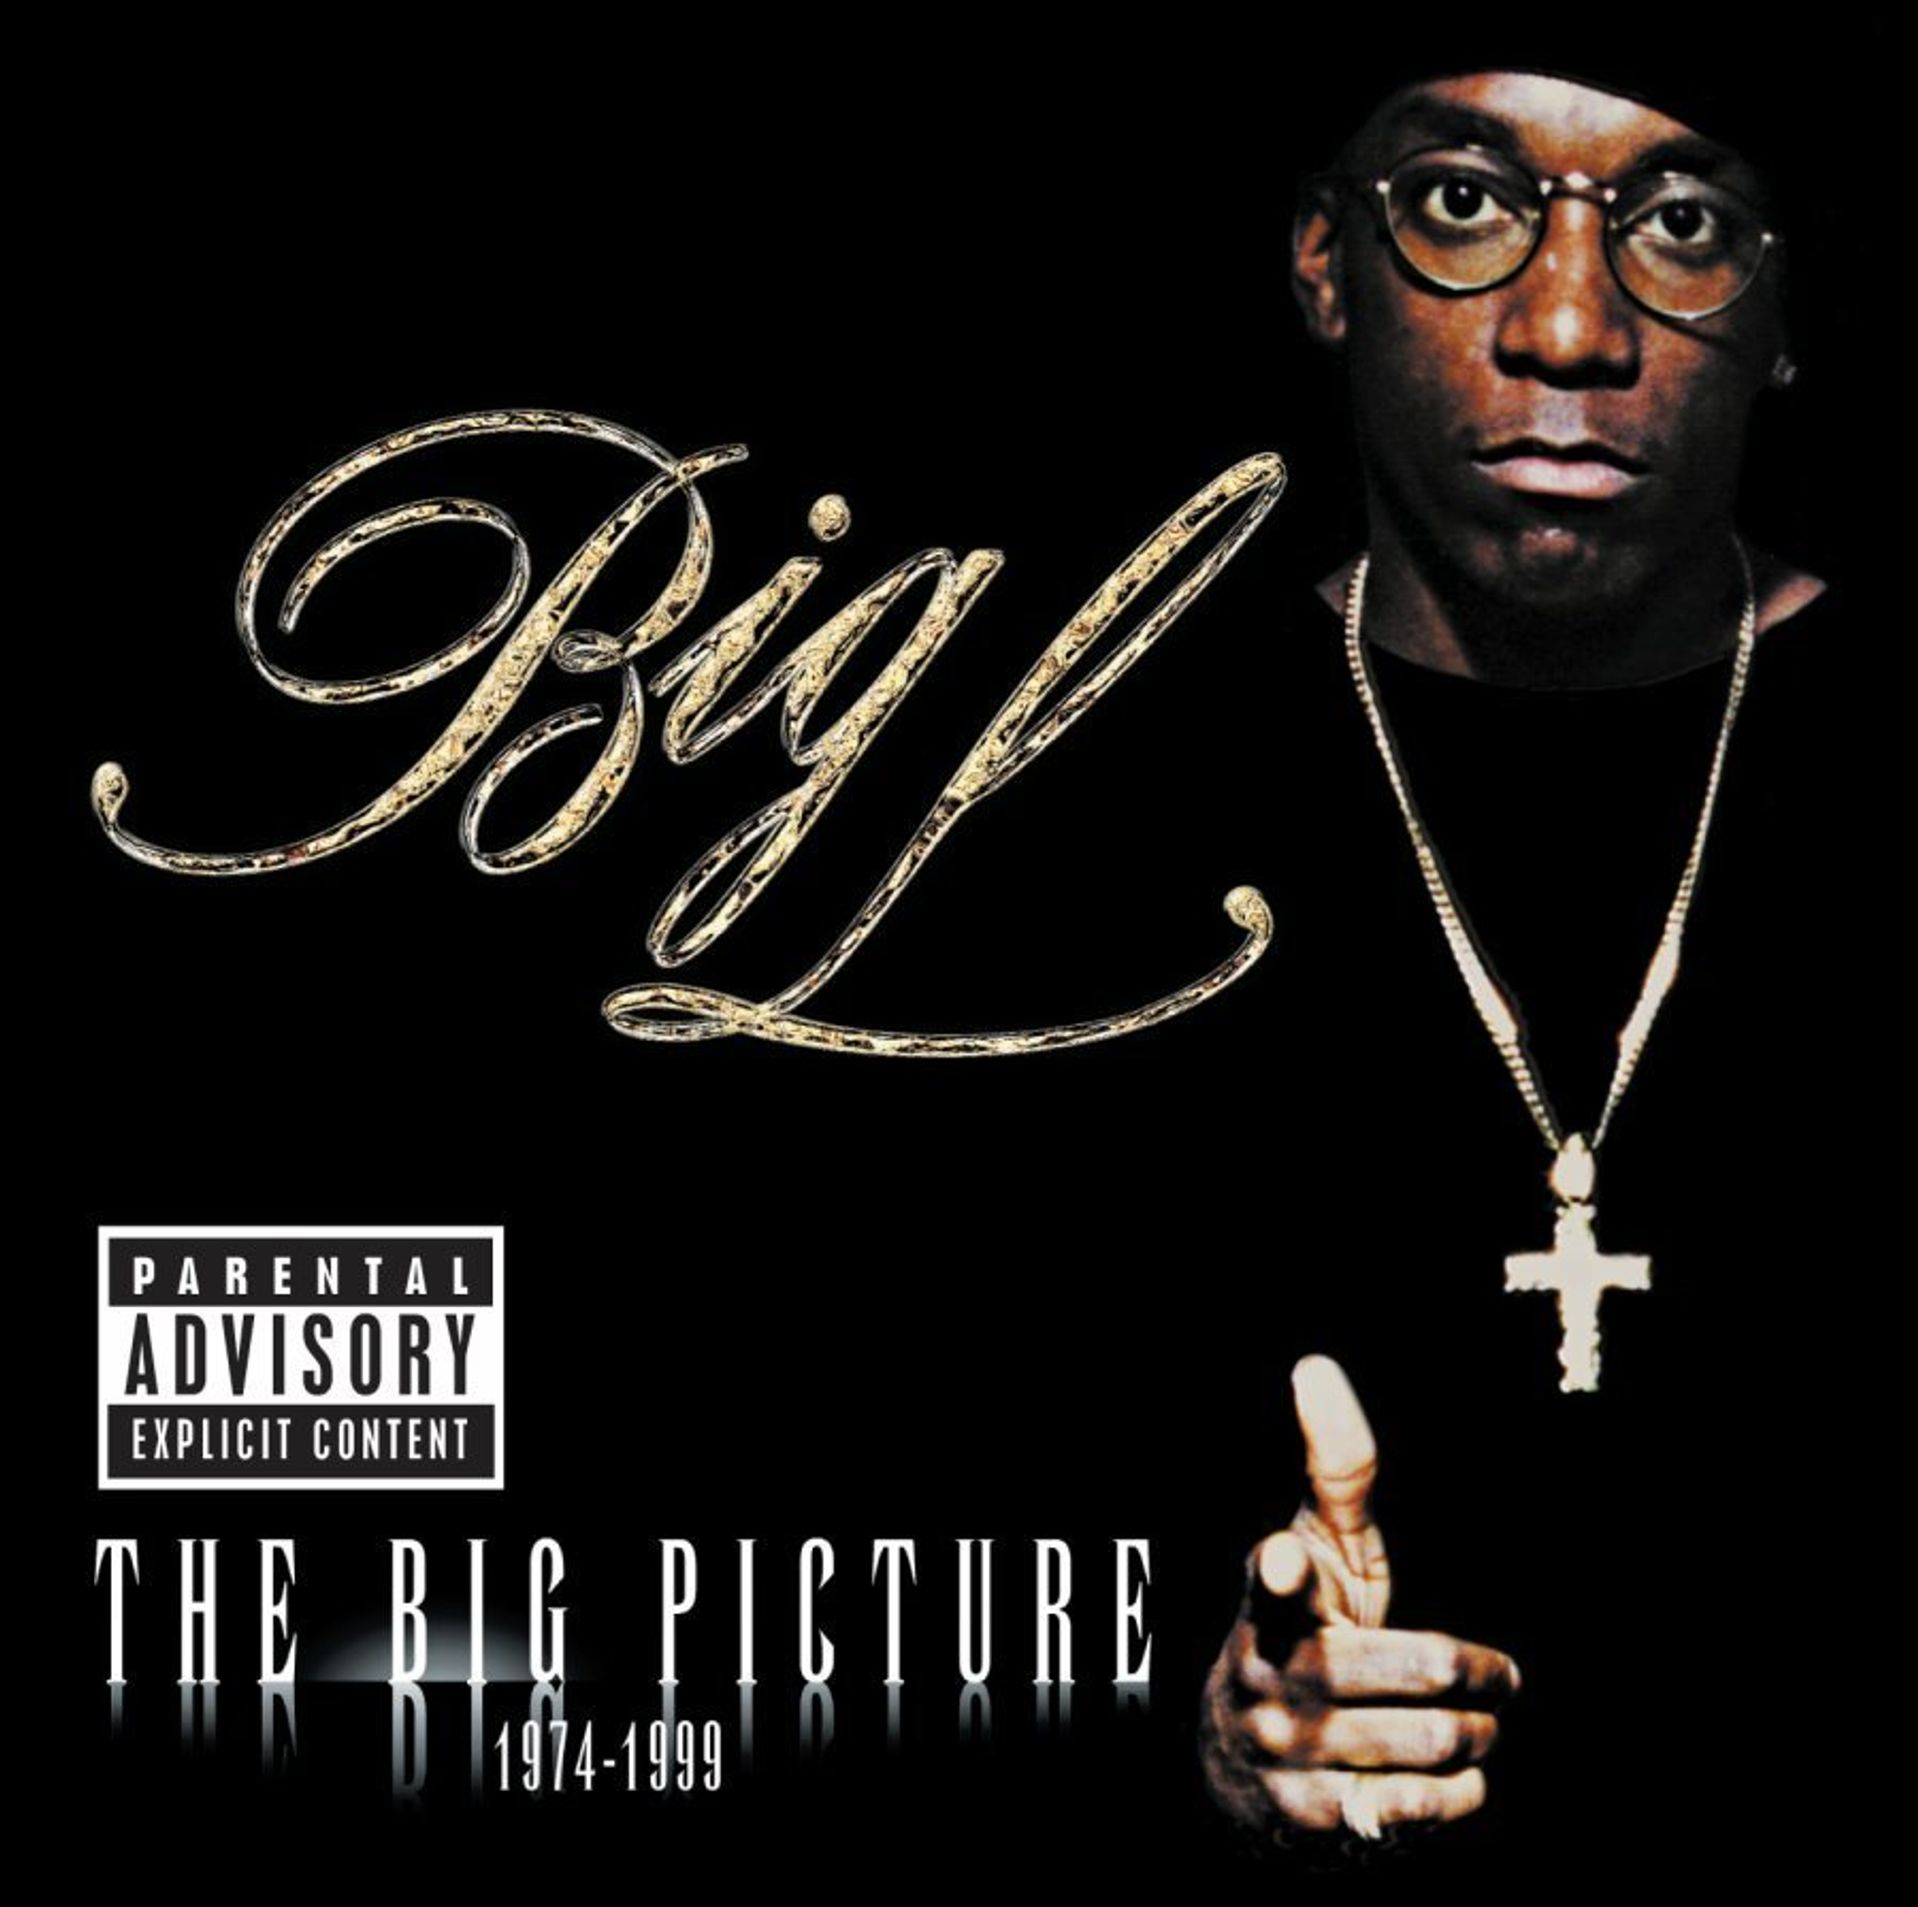 Album Title: The Big Picture by: Big L